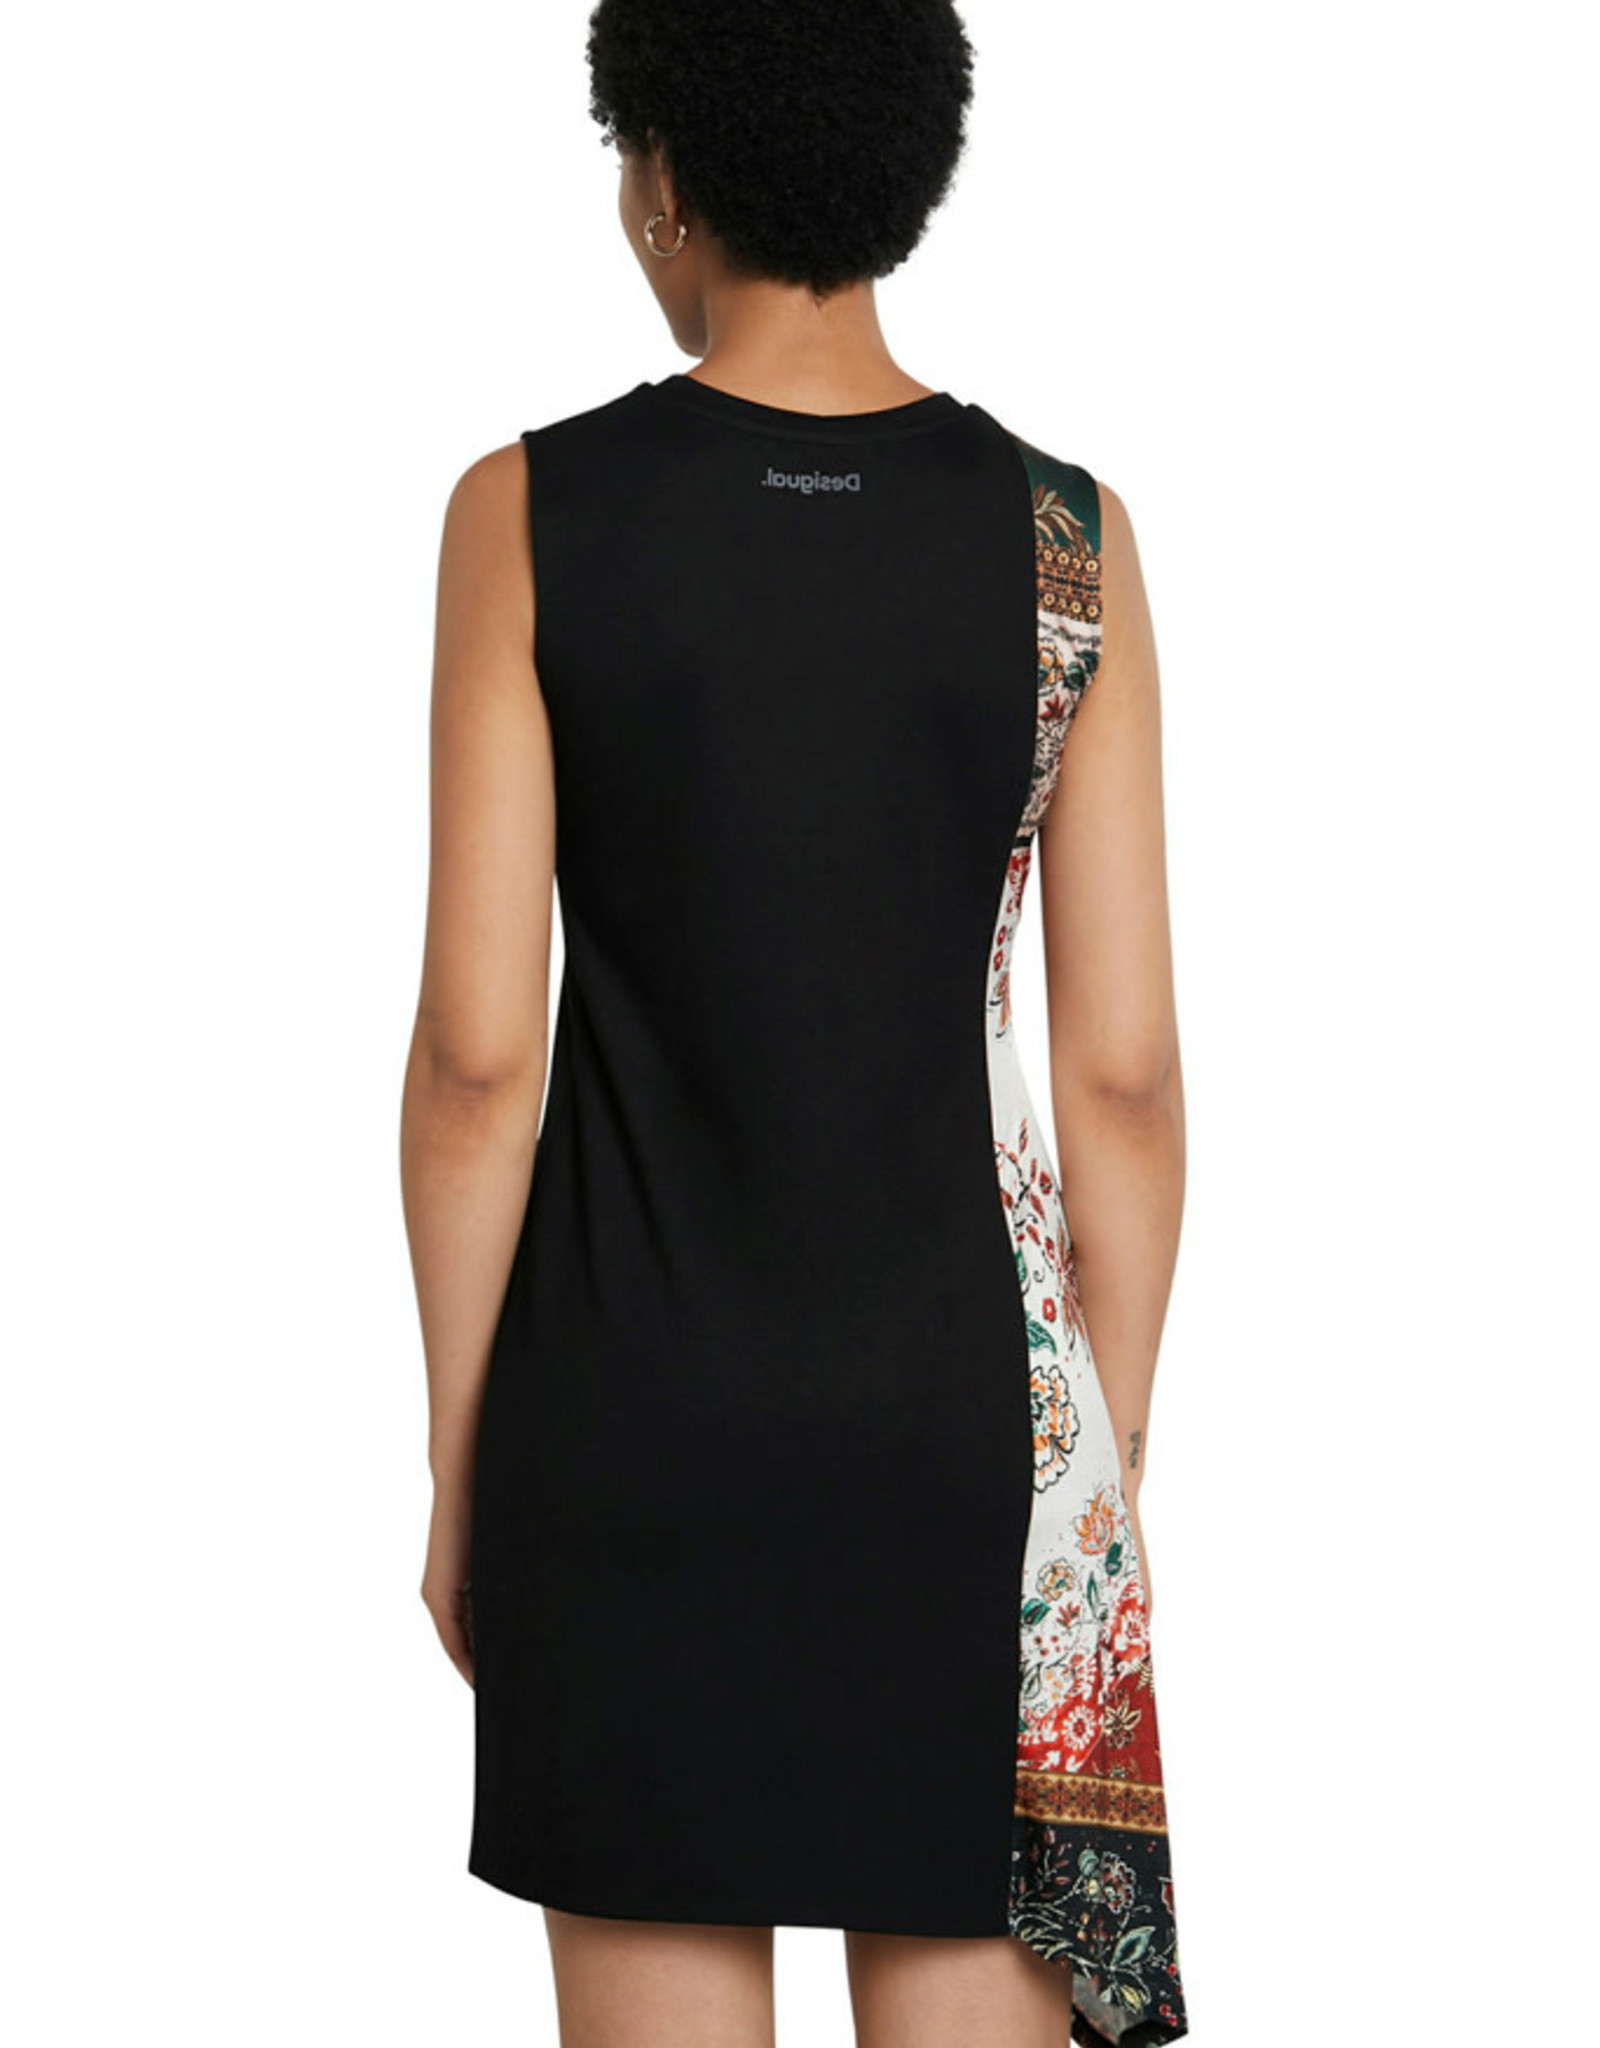 DESIG 21SWVK28 2000 Black Thaiyu Dress